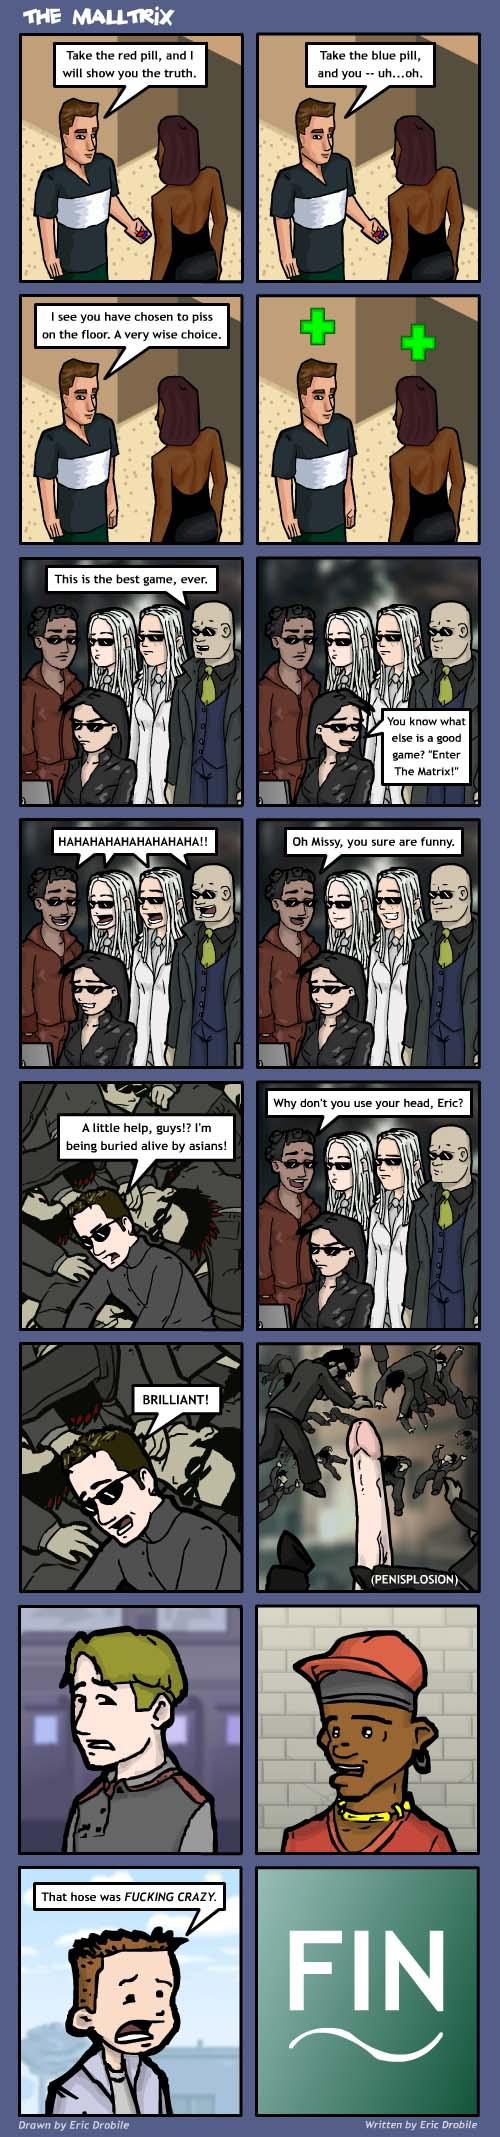 Mall Monkeys Comic - The Malltrix Part 3